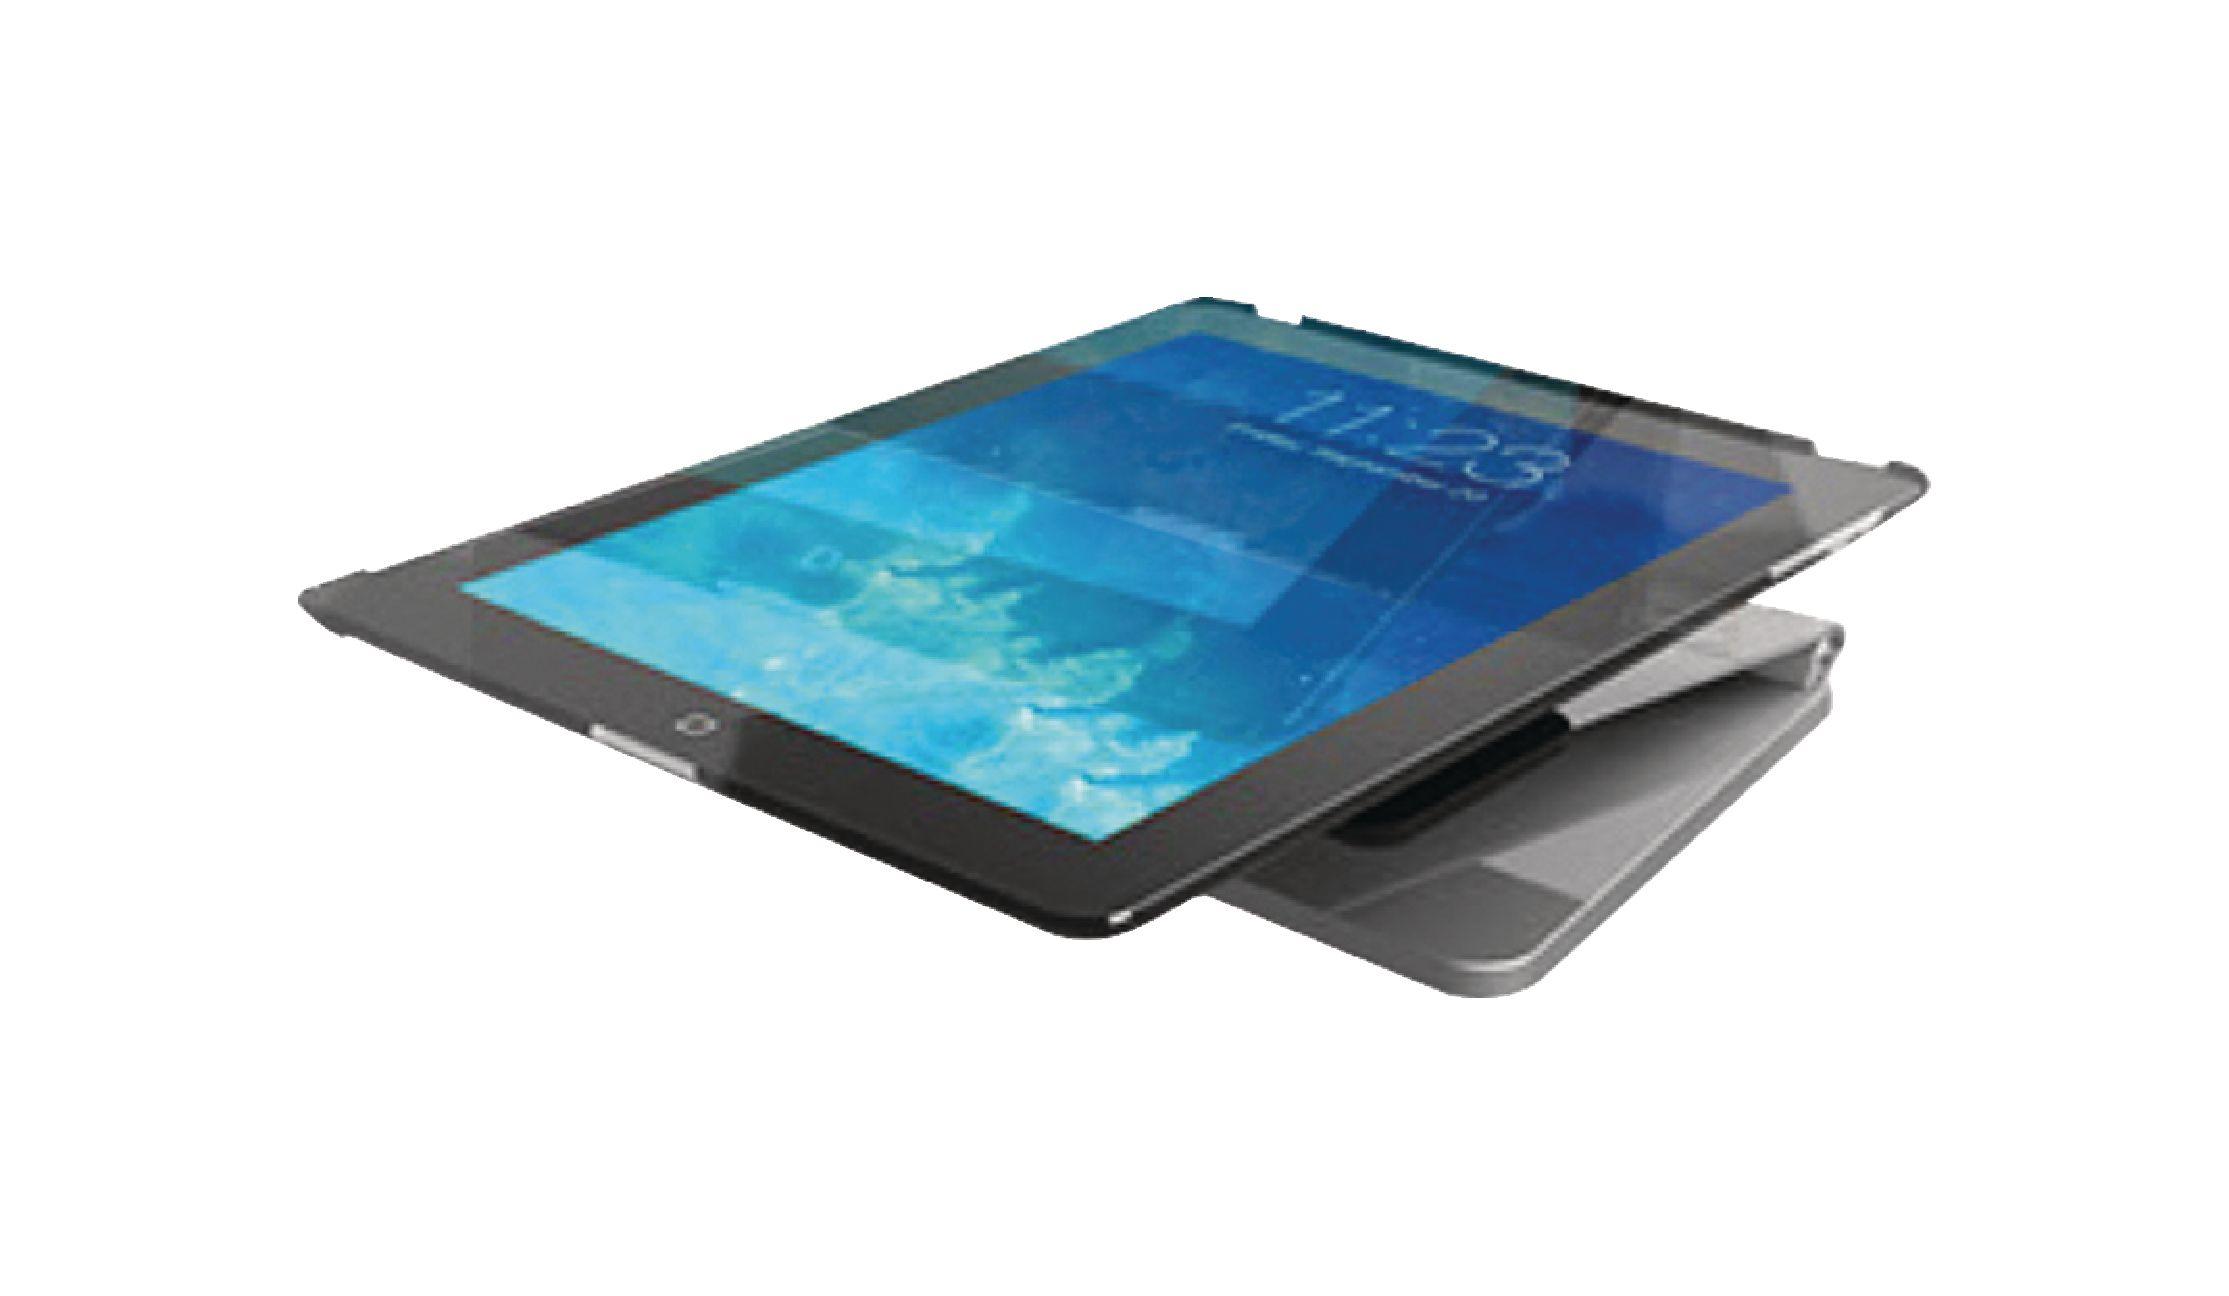 OMN-IPA - Omnimount - Tablet Stand Full Motion Apple iPad Air